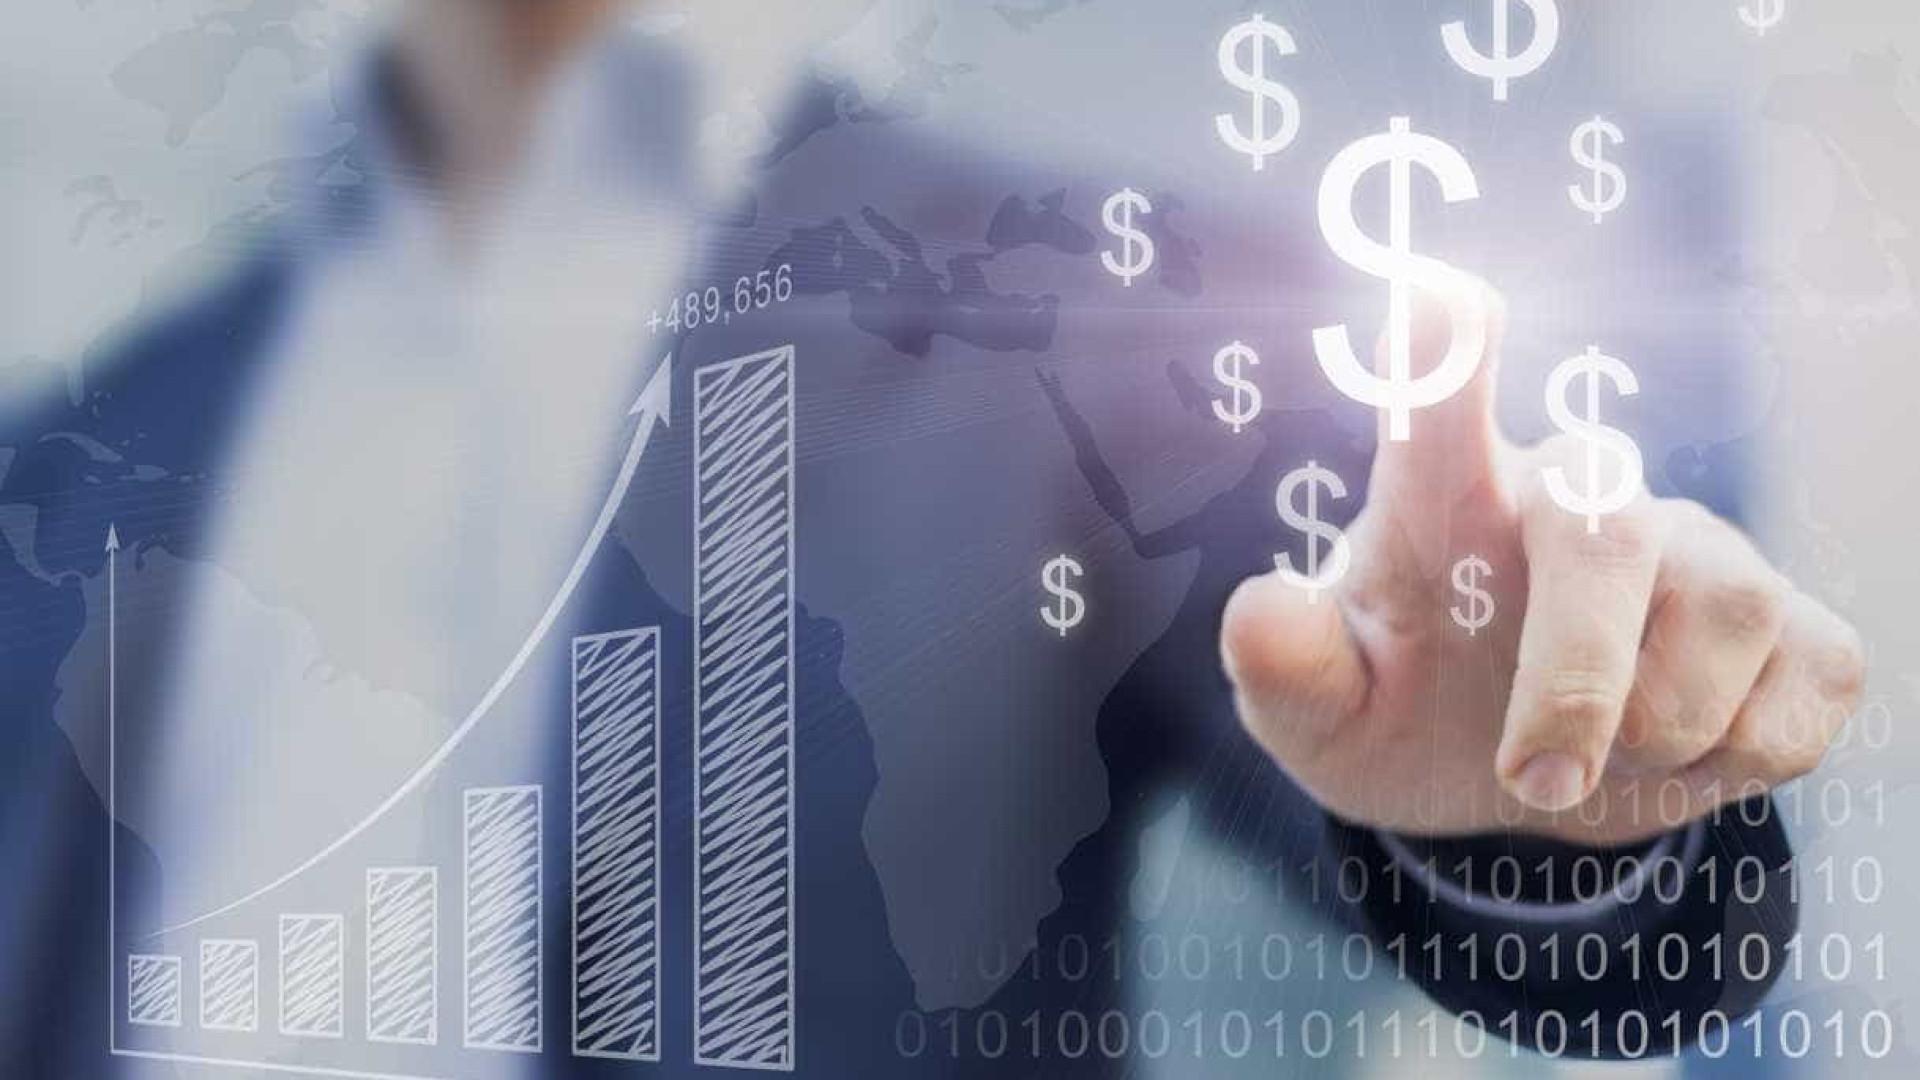 Retirados mais de 120 mil euros de 'bitcoins' das contas do WannaCry